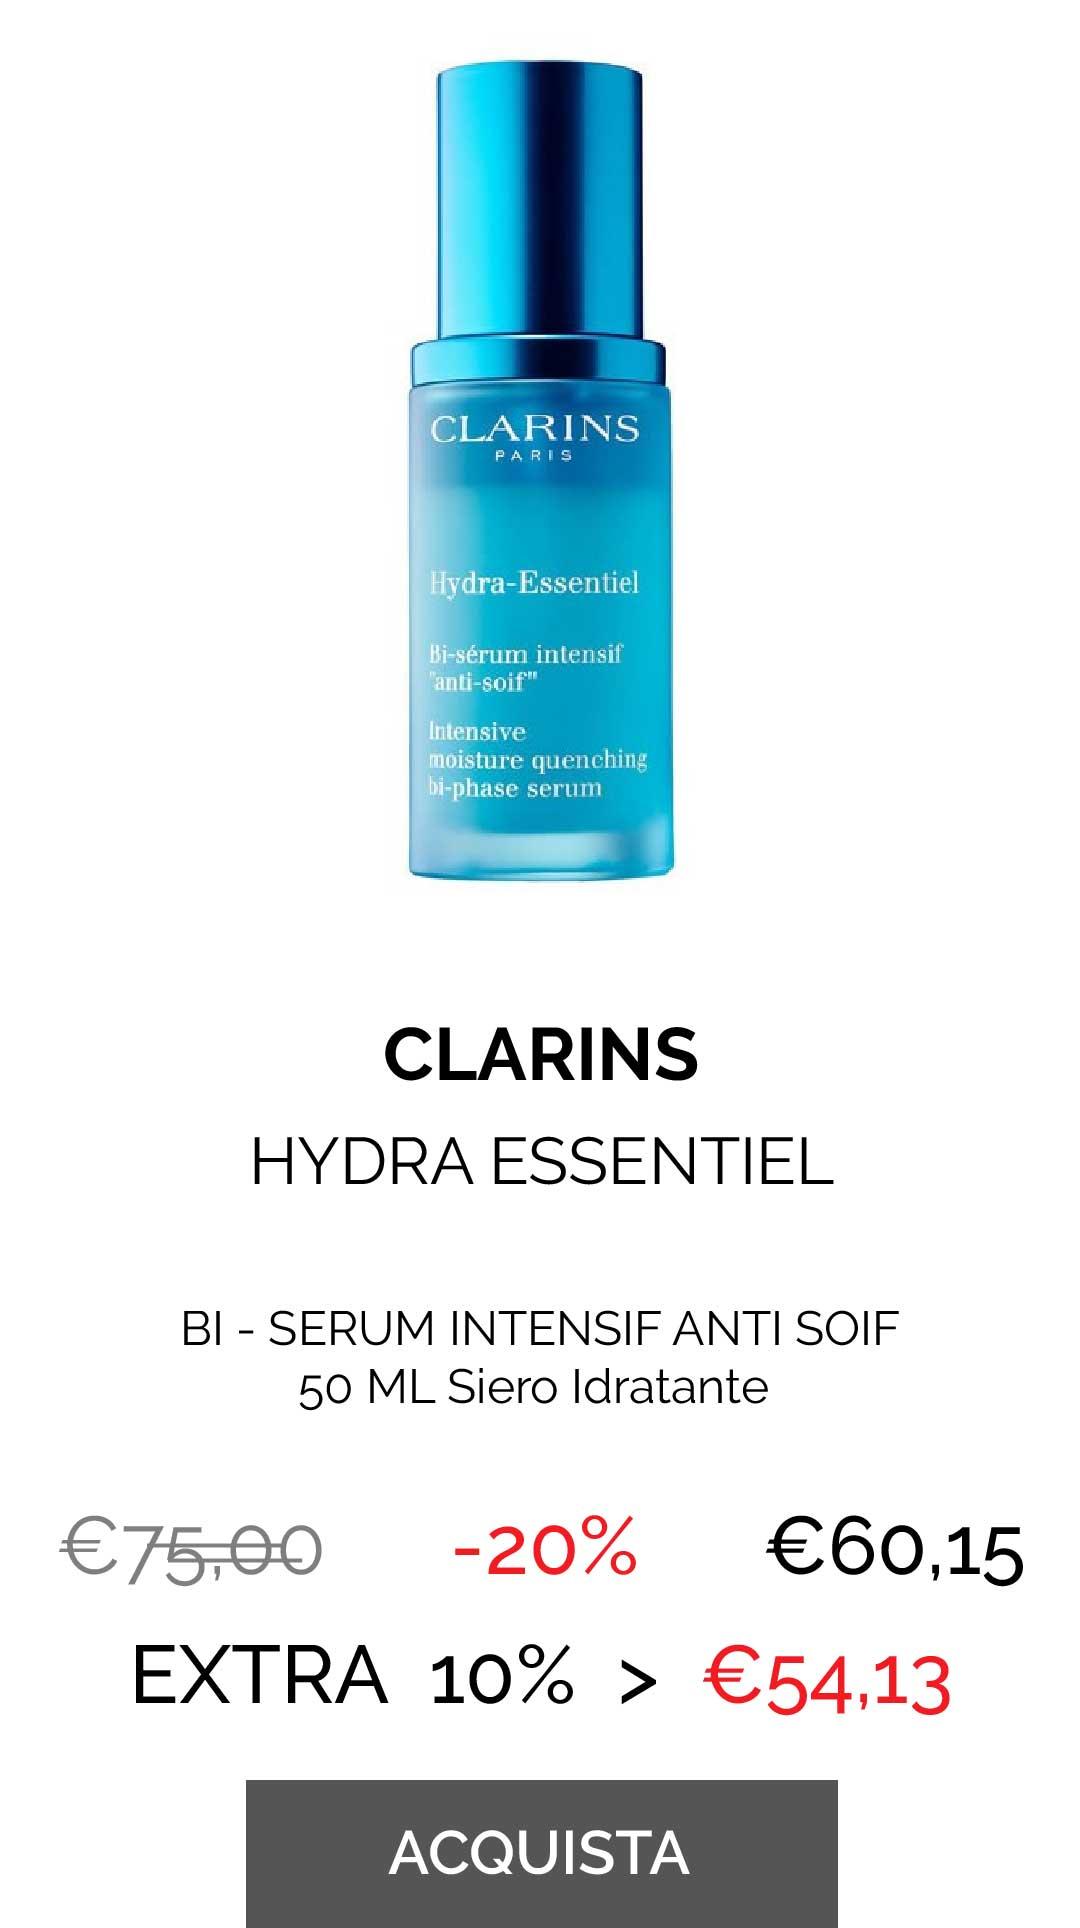 BI - SERUM INTENSIF ANTI SOIF 50 ML siero idratante